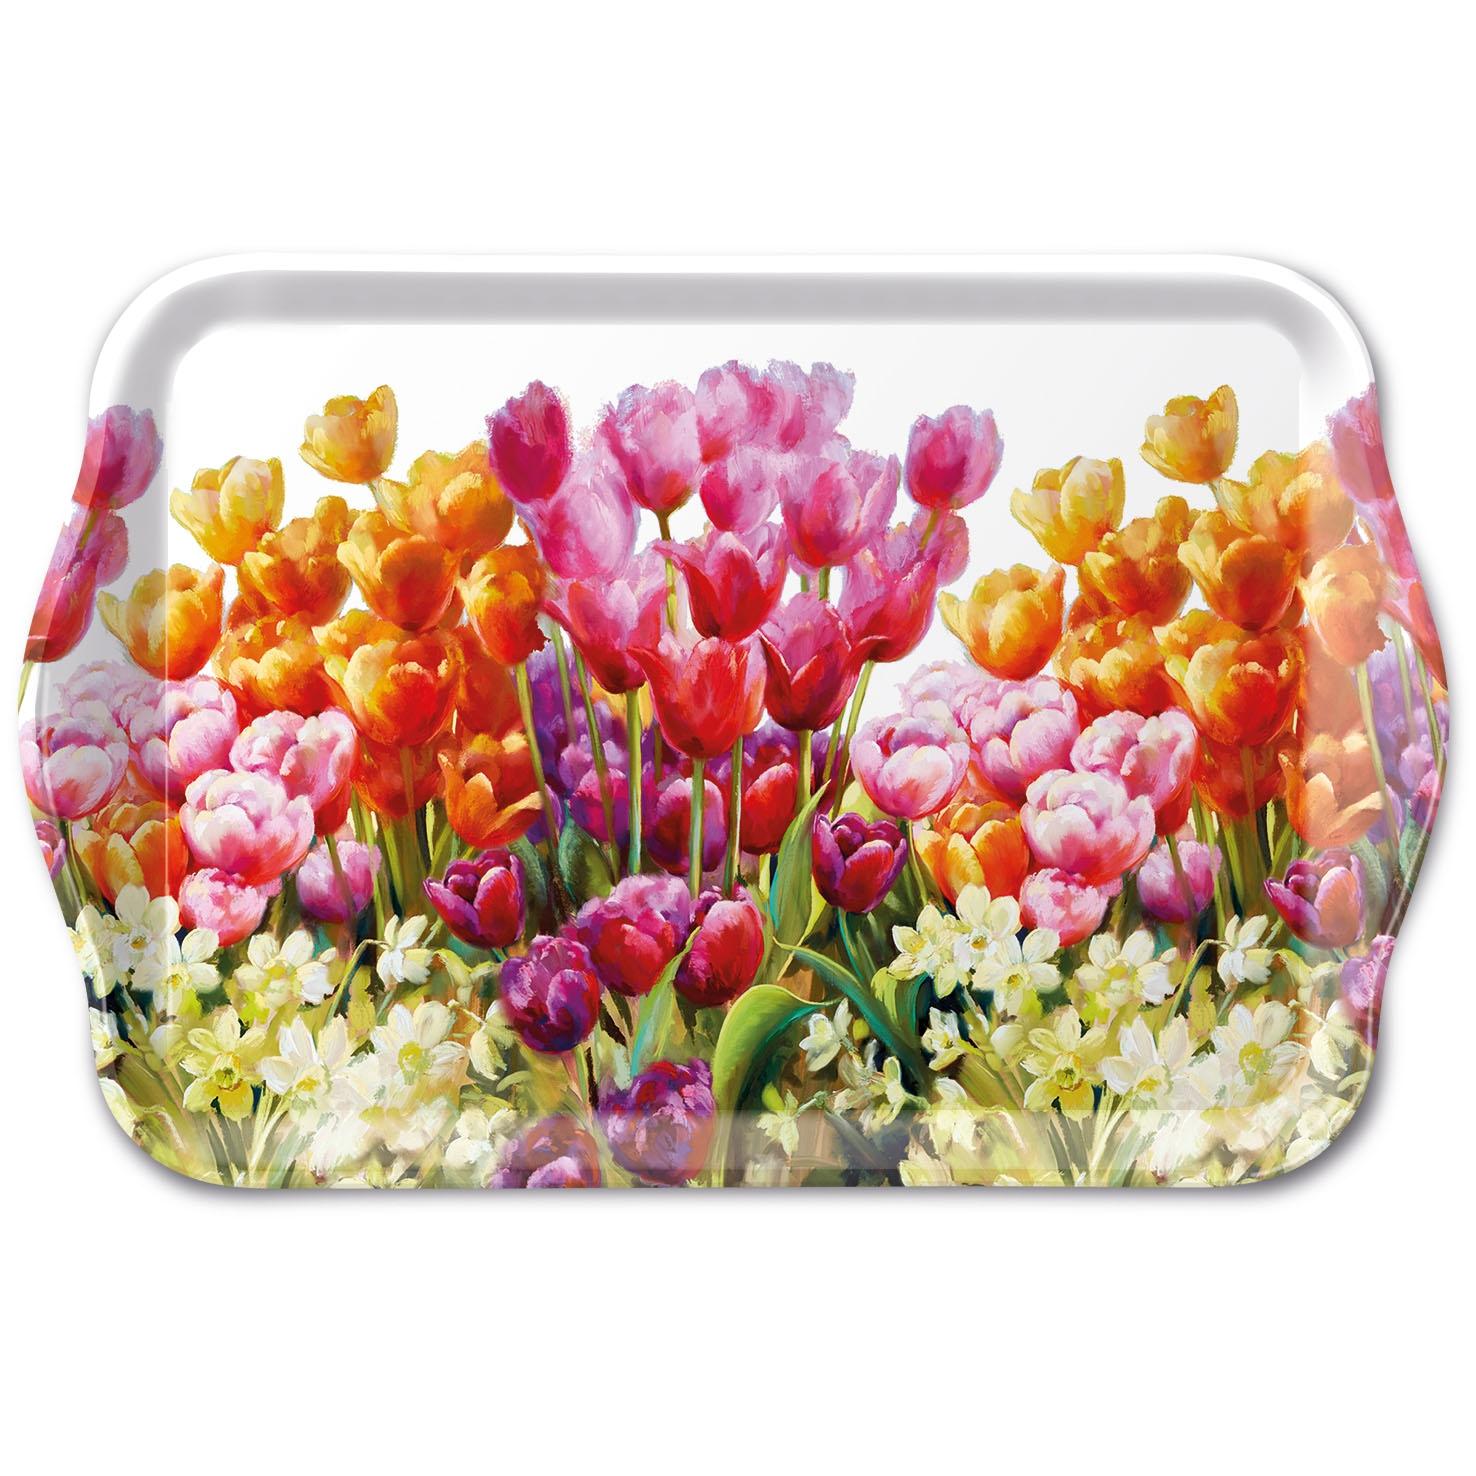 bandeja - Tulips